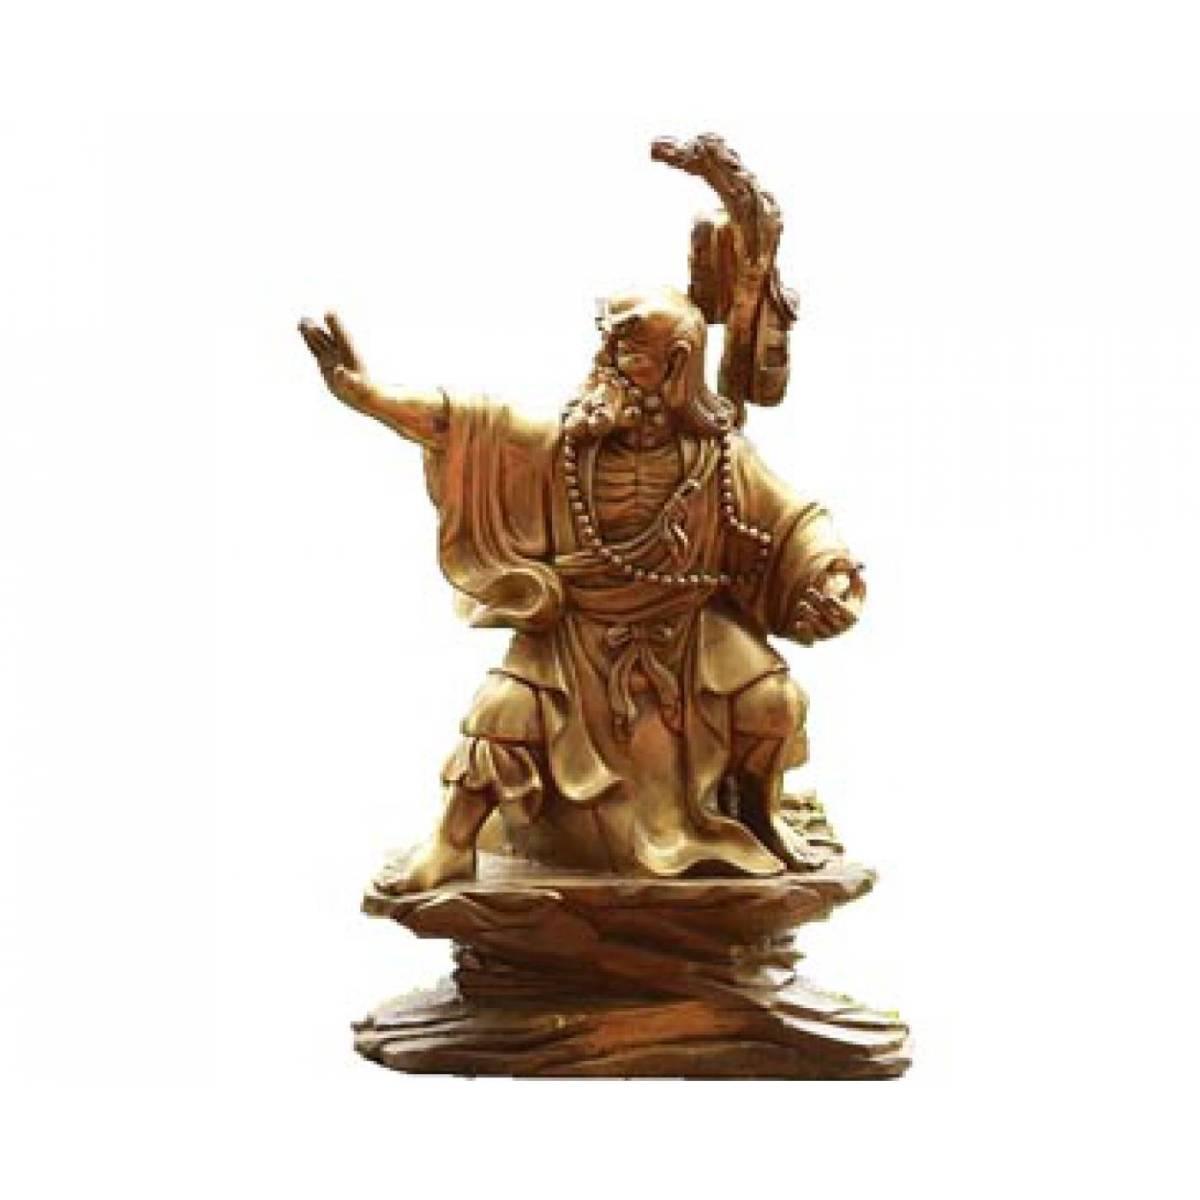 Bodhidharma's 2 Entries